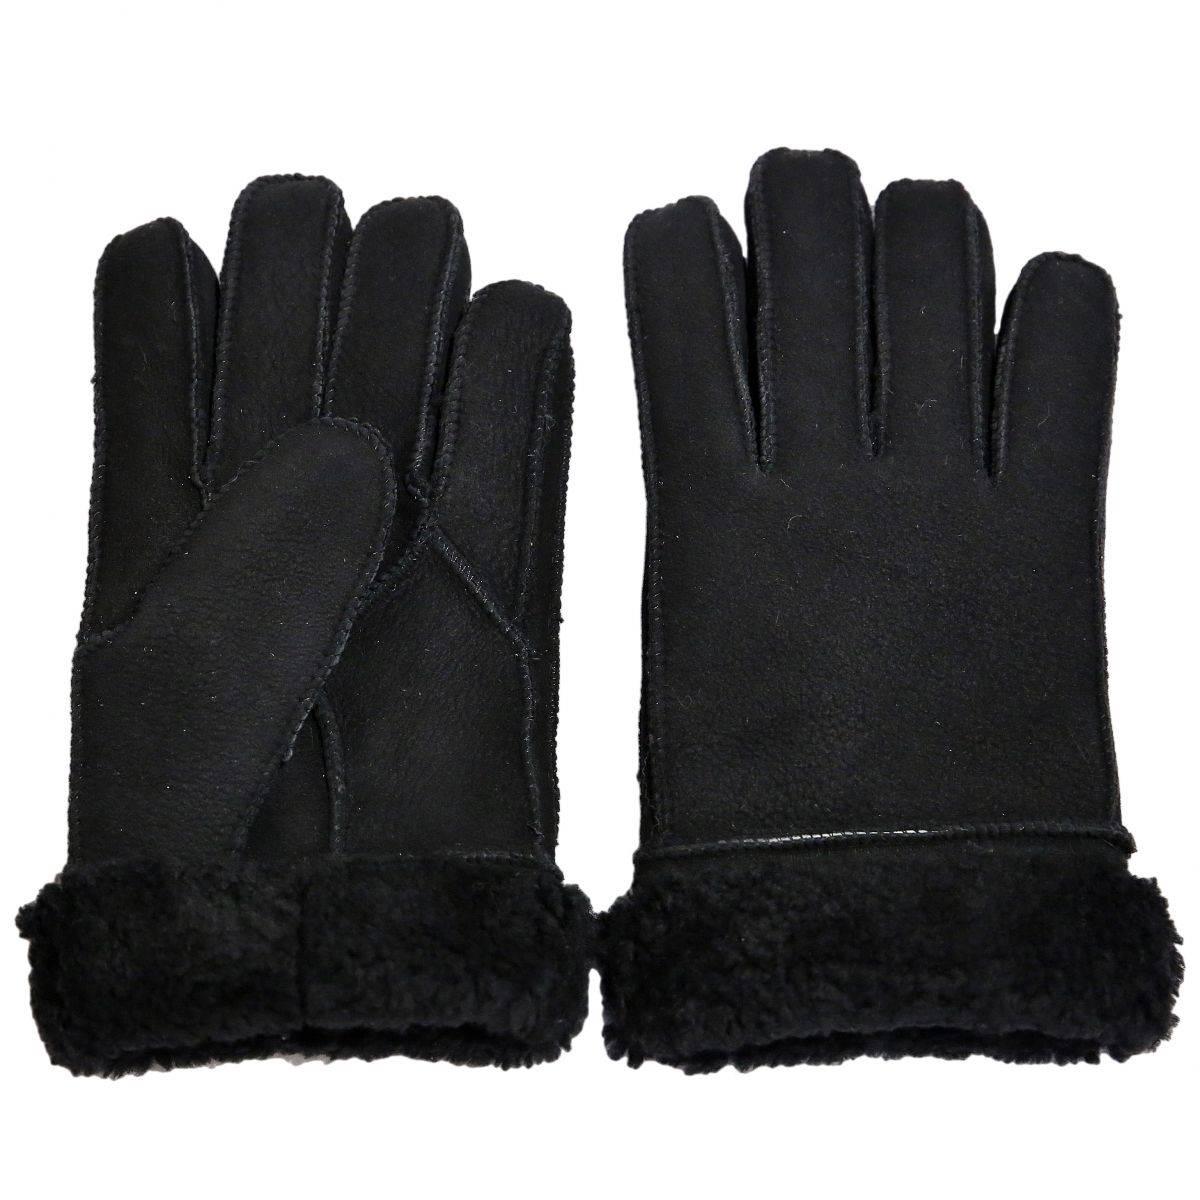 lammfell fingerhandschuhe burak herren handschuhe. Black Bedroom Furniture Sets. Home Design Ideas